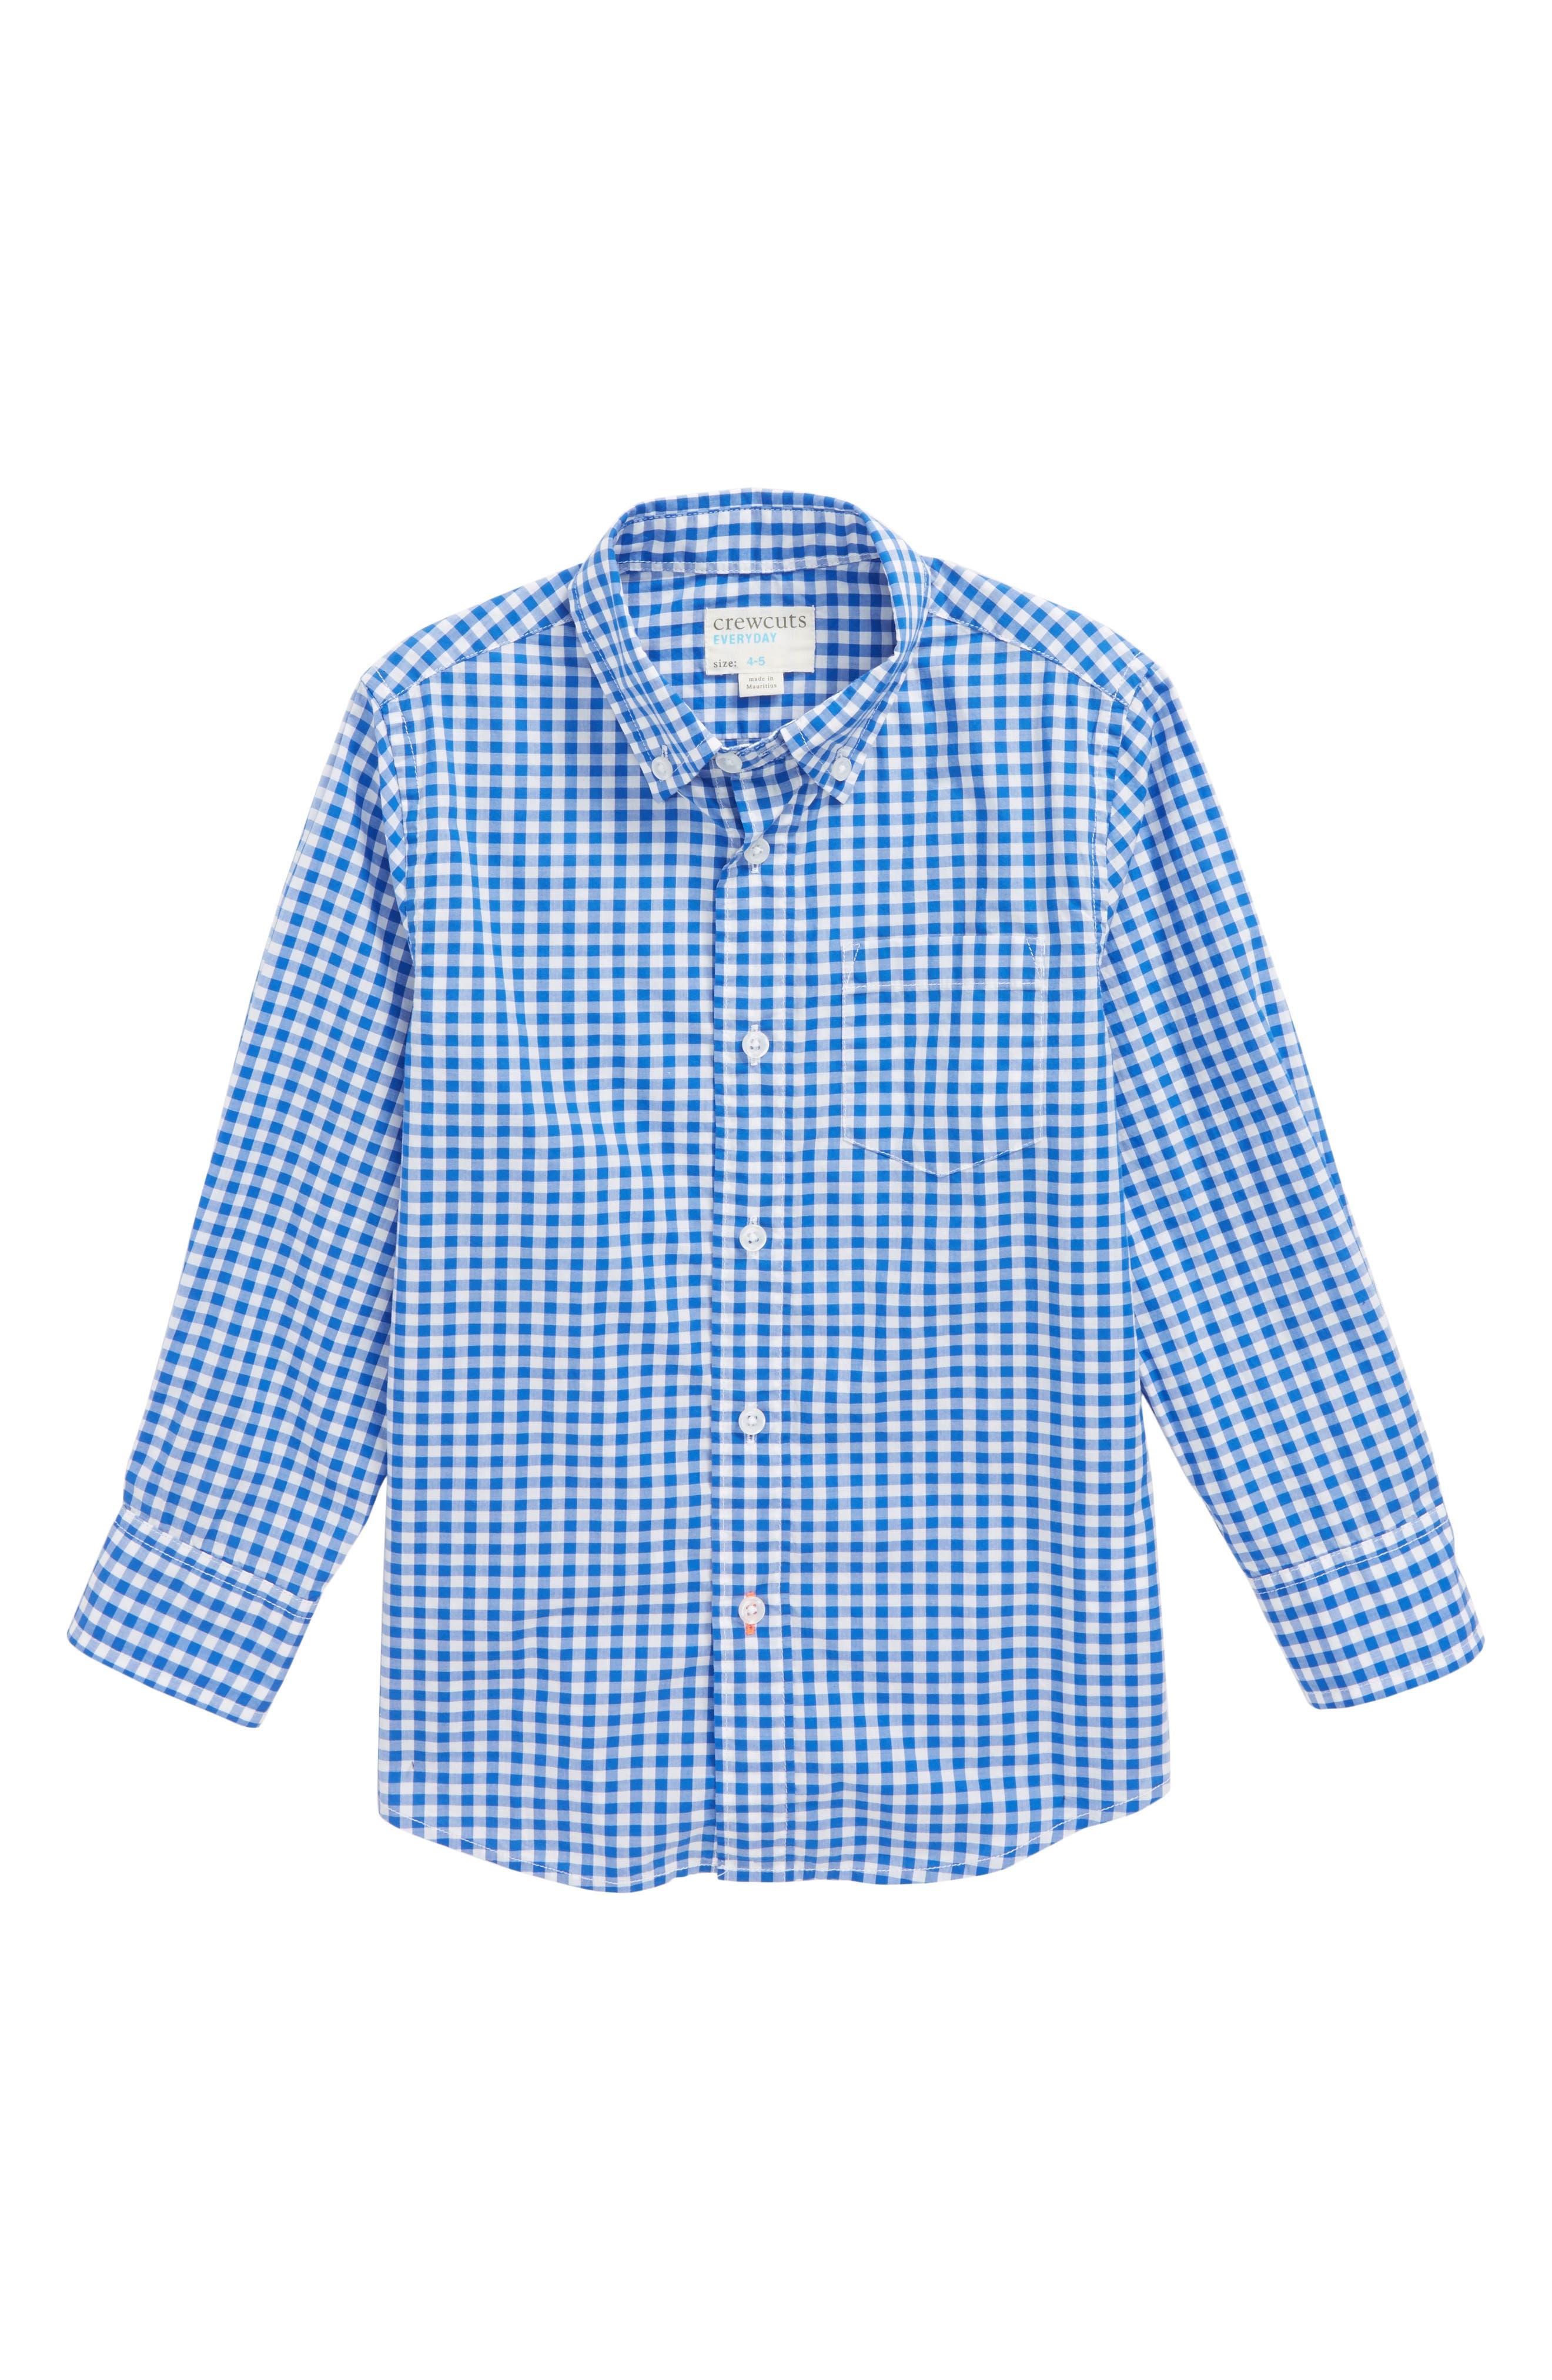 crewcuts by J.Crew Jenson Gingham Woven Shirt (Toddler Boys, Little Boys & Big Boys)